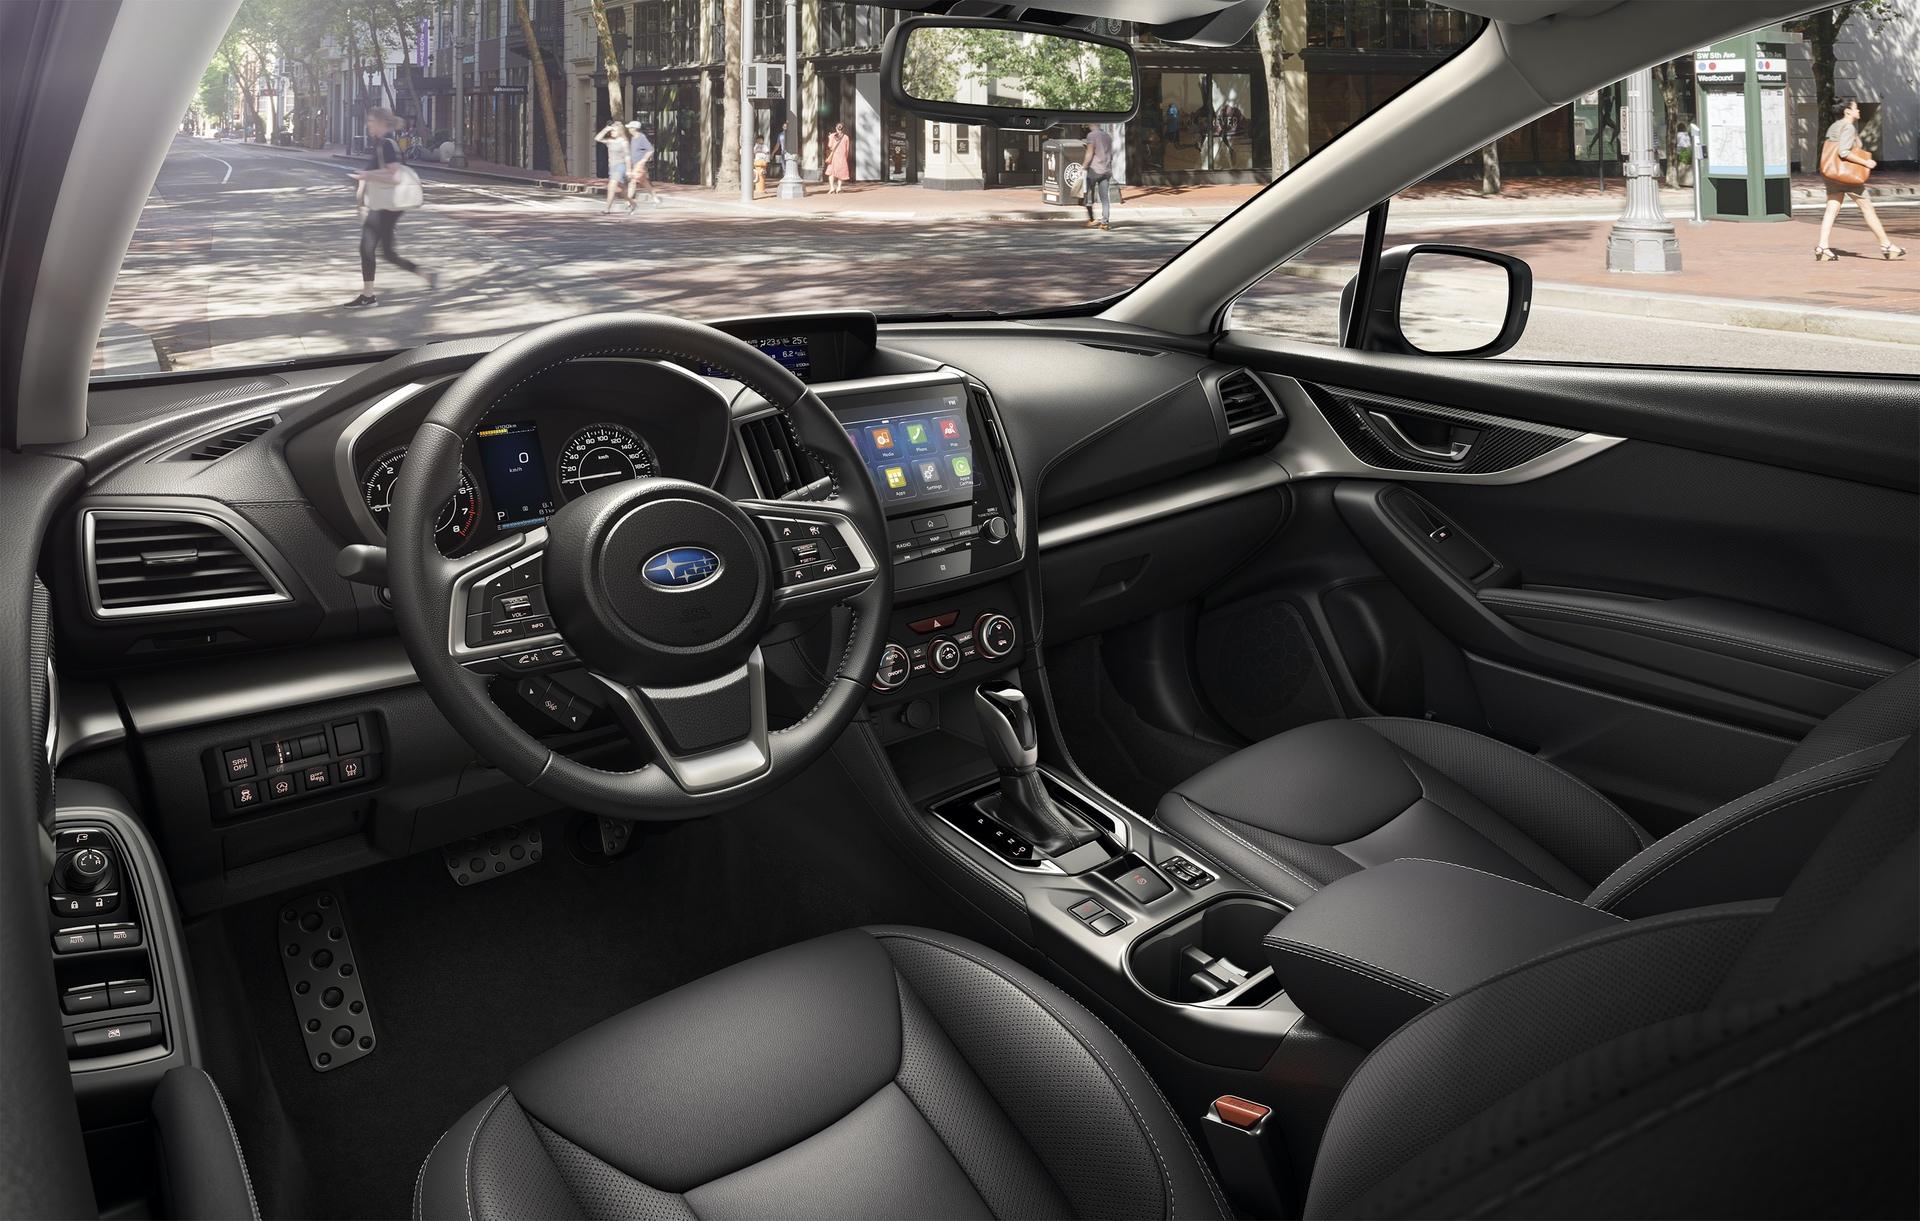 First_Drive_Subaru_Impreza_0005